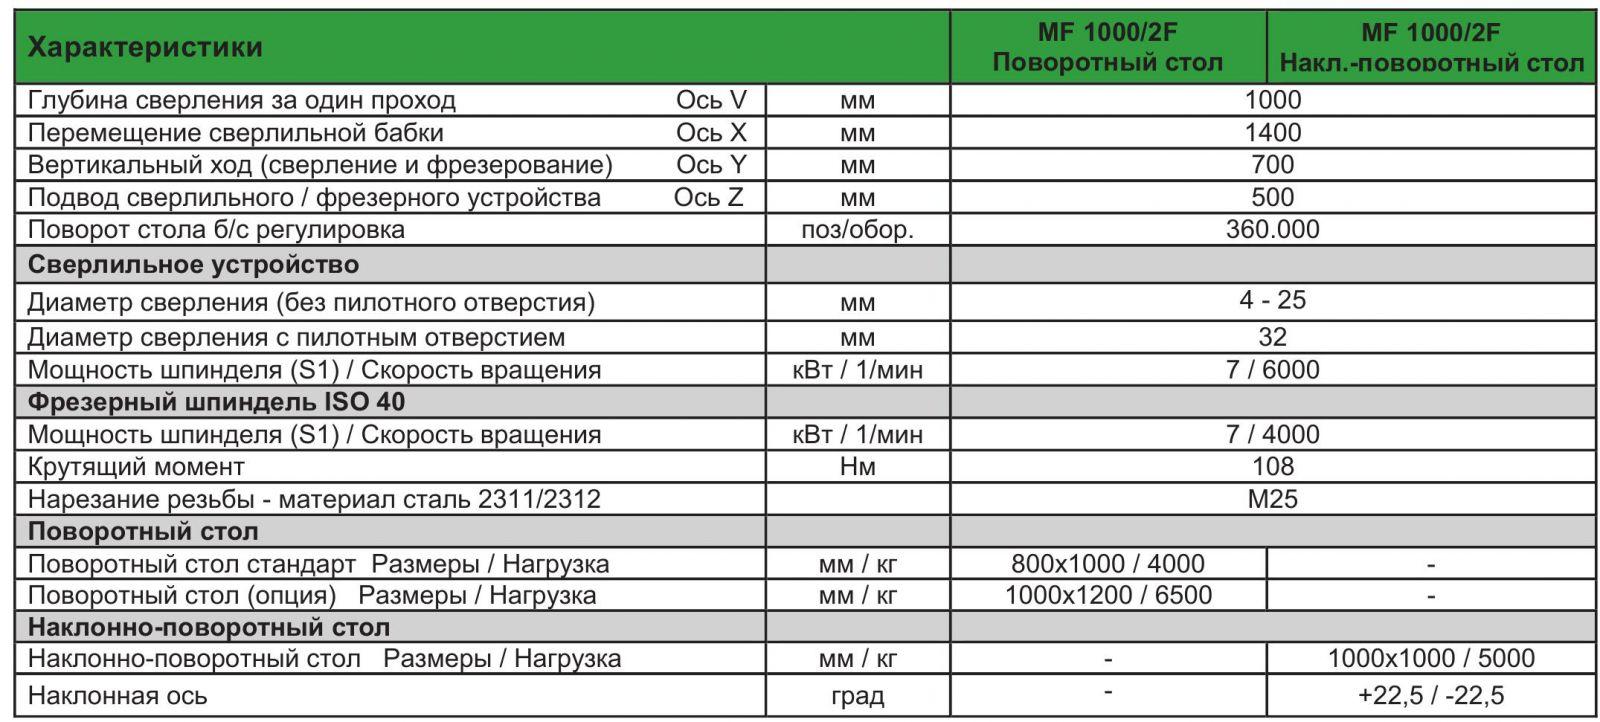 I.M.S.A MF 10002F характеристики